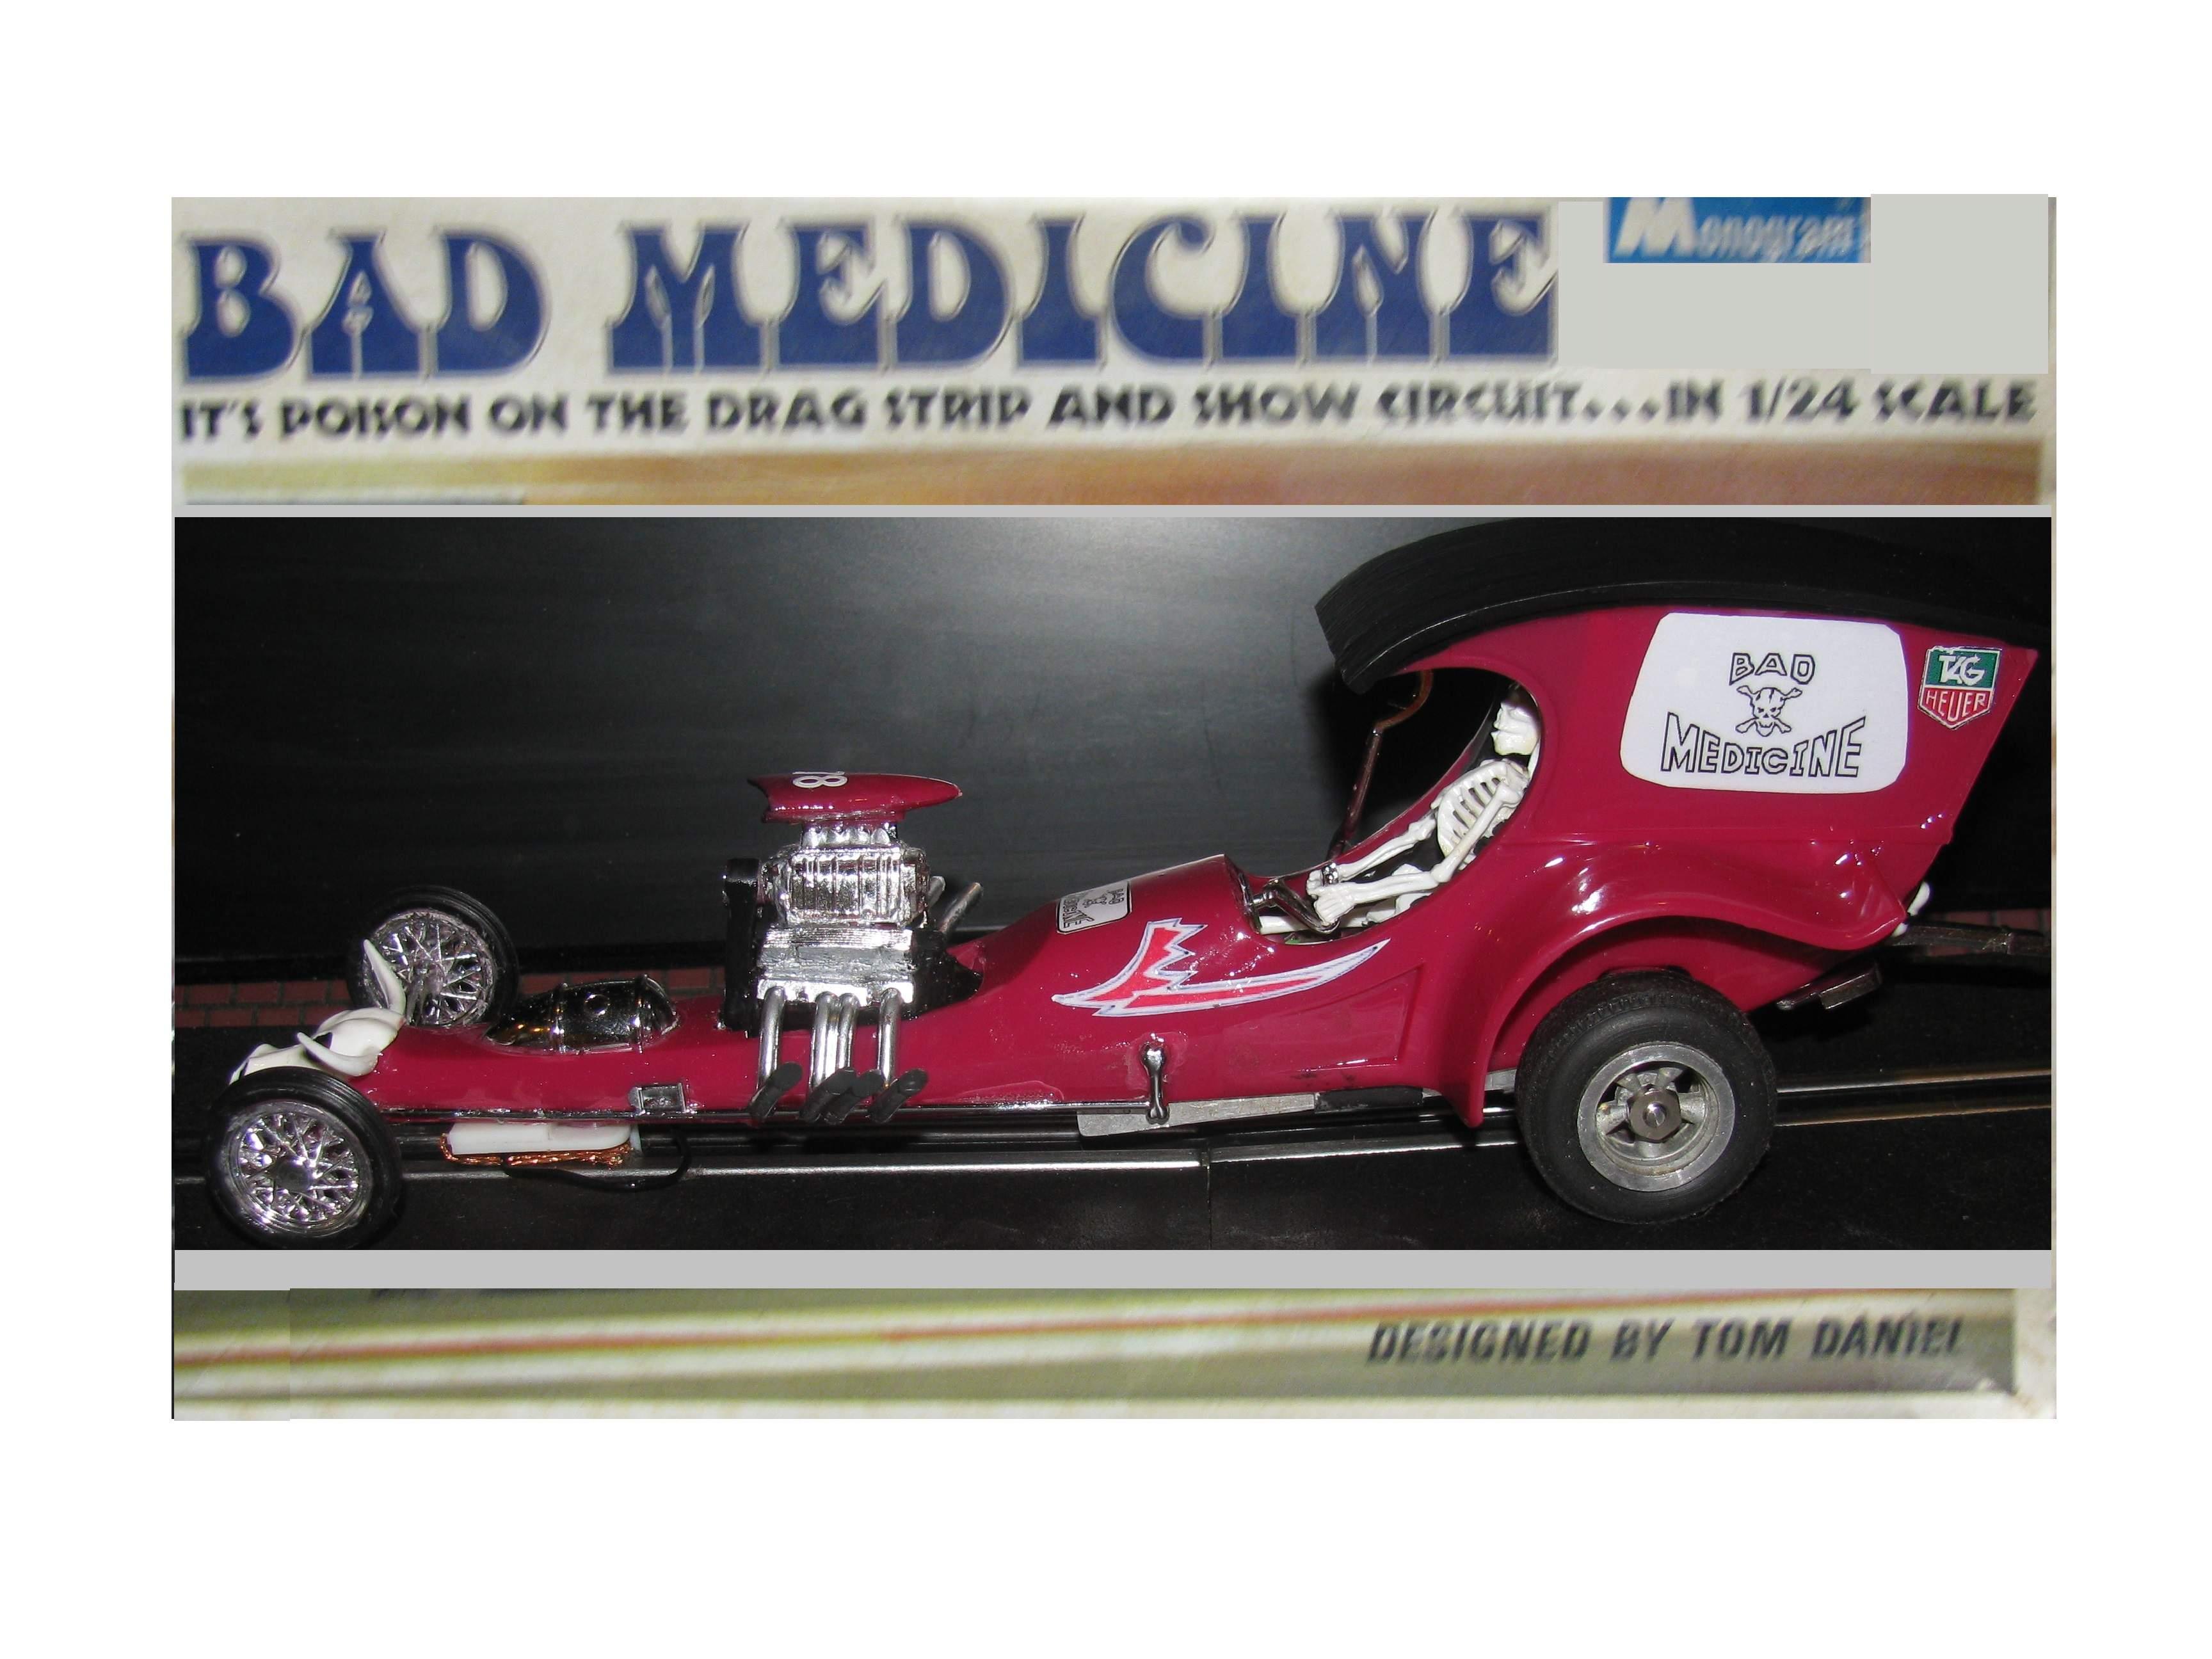 *SOLD* * Winter Super Sale * Bad Medicine Dragster by Monogram designed by Tom Daniel's Slot Car 1:24 Scale #78